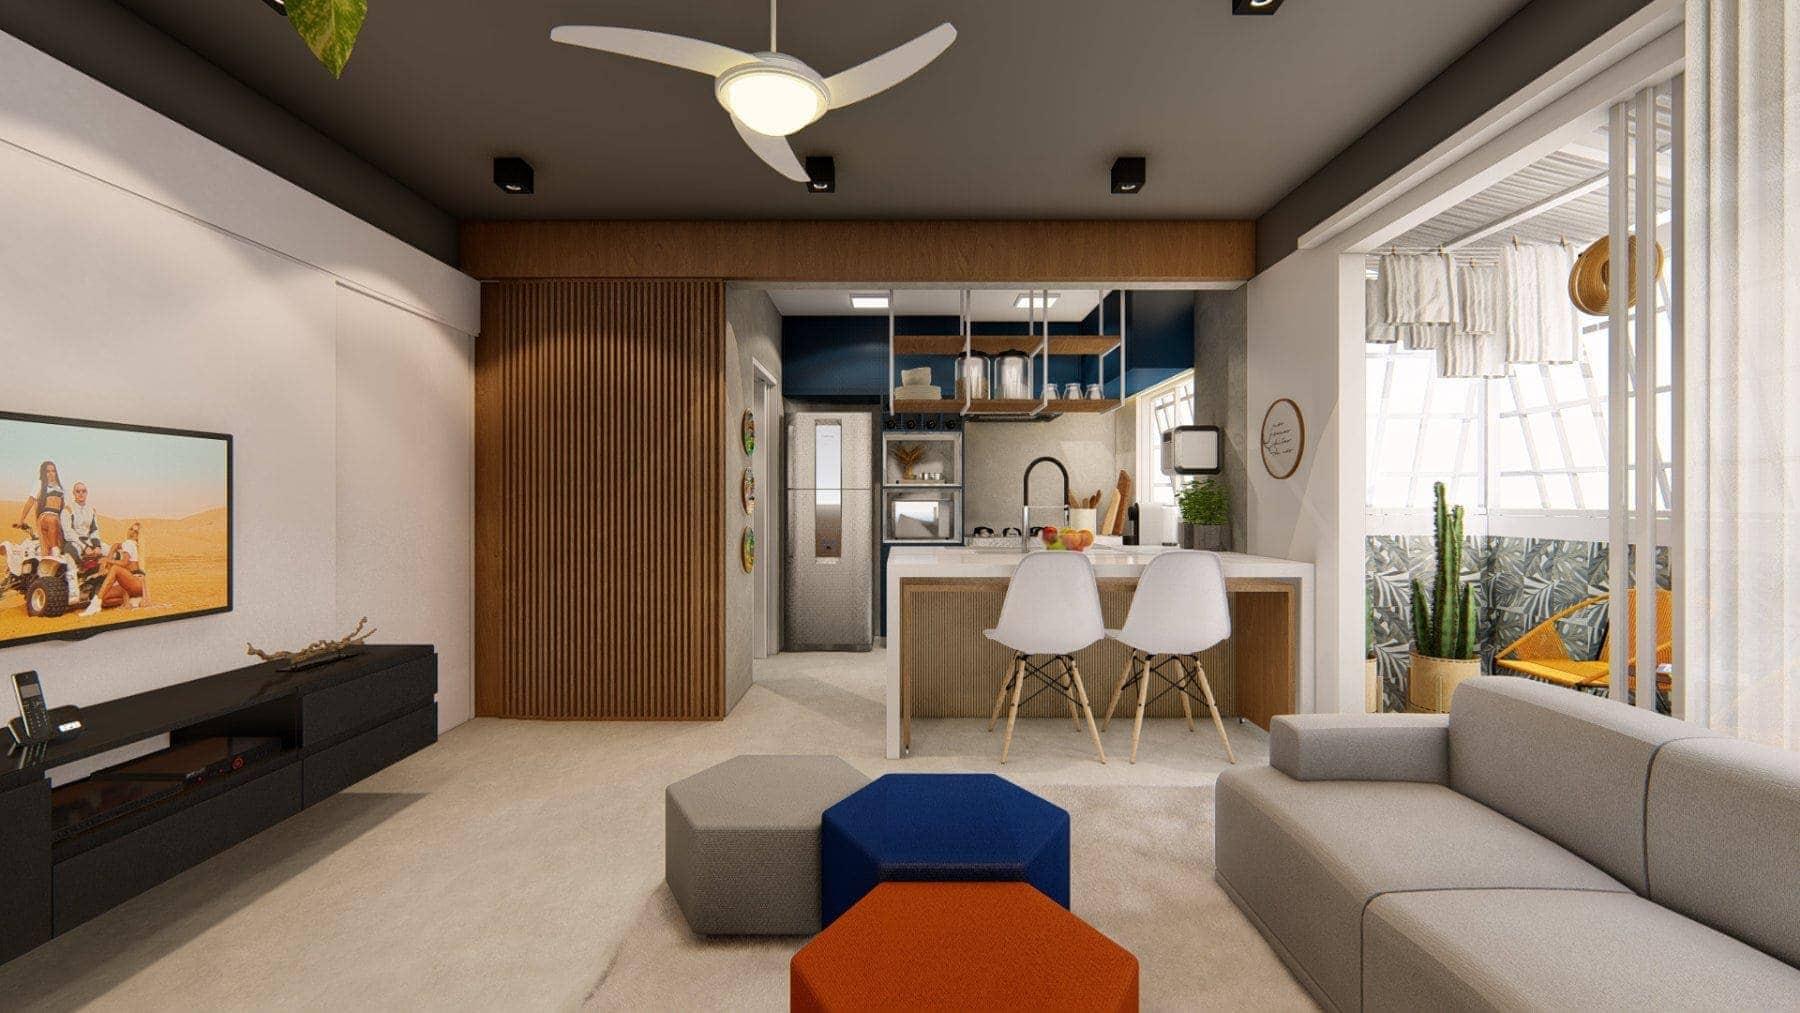 Projeto Interior - Motirõ Estudio &Bull; - 13 &Bull; Deezign